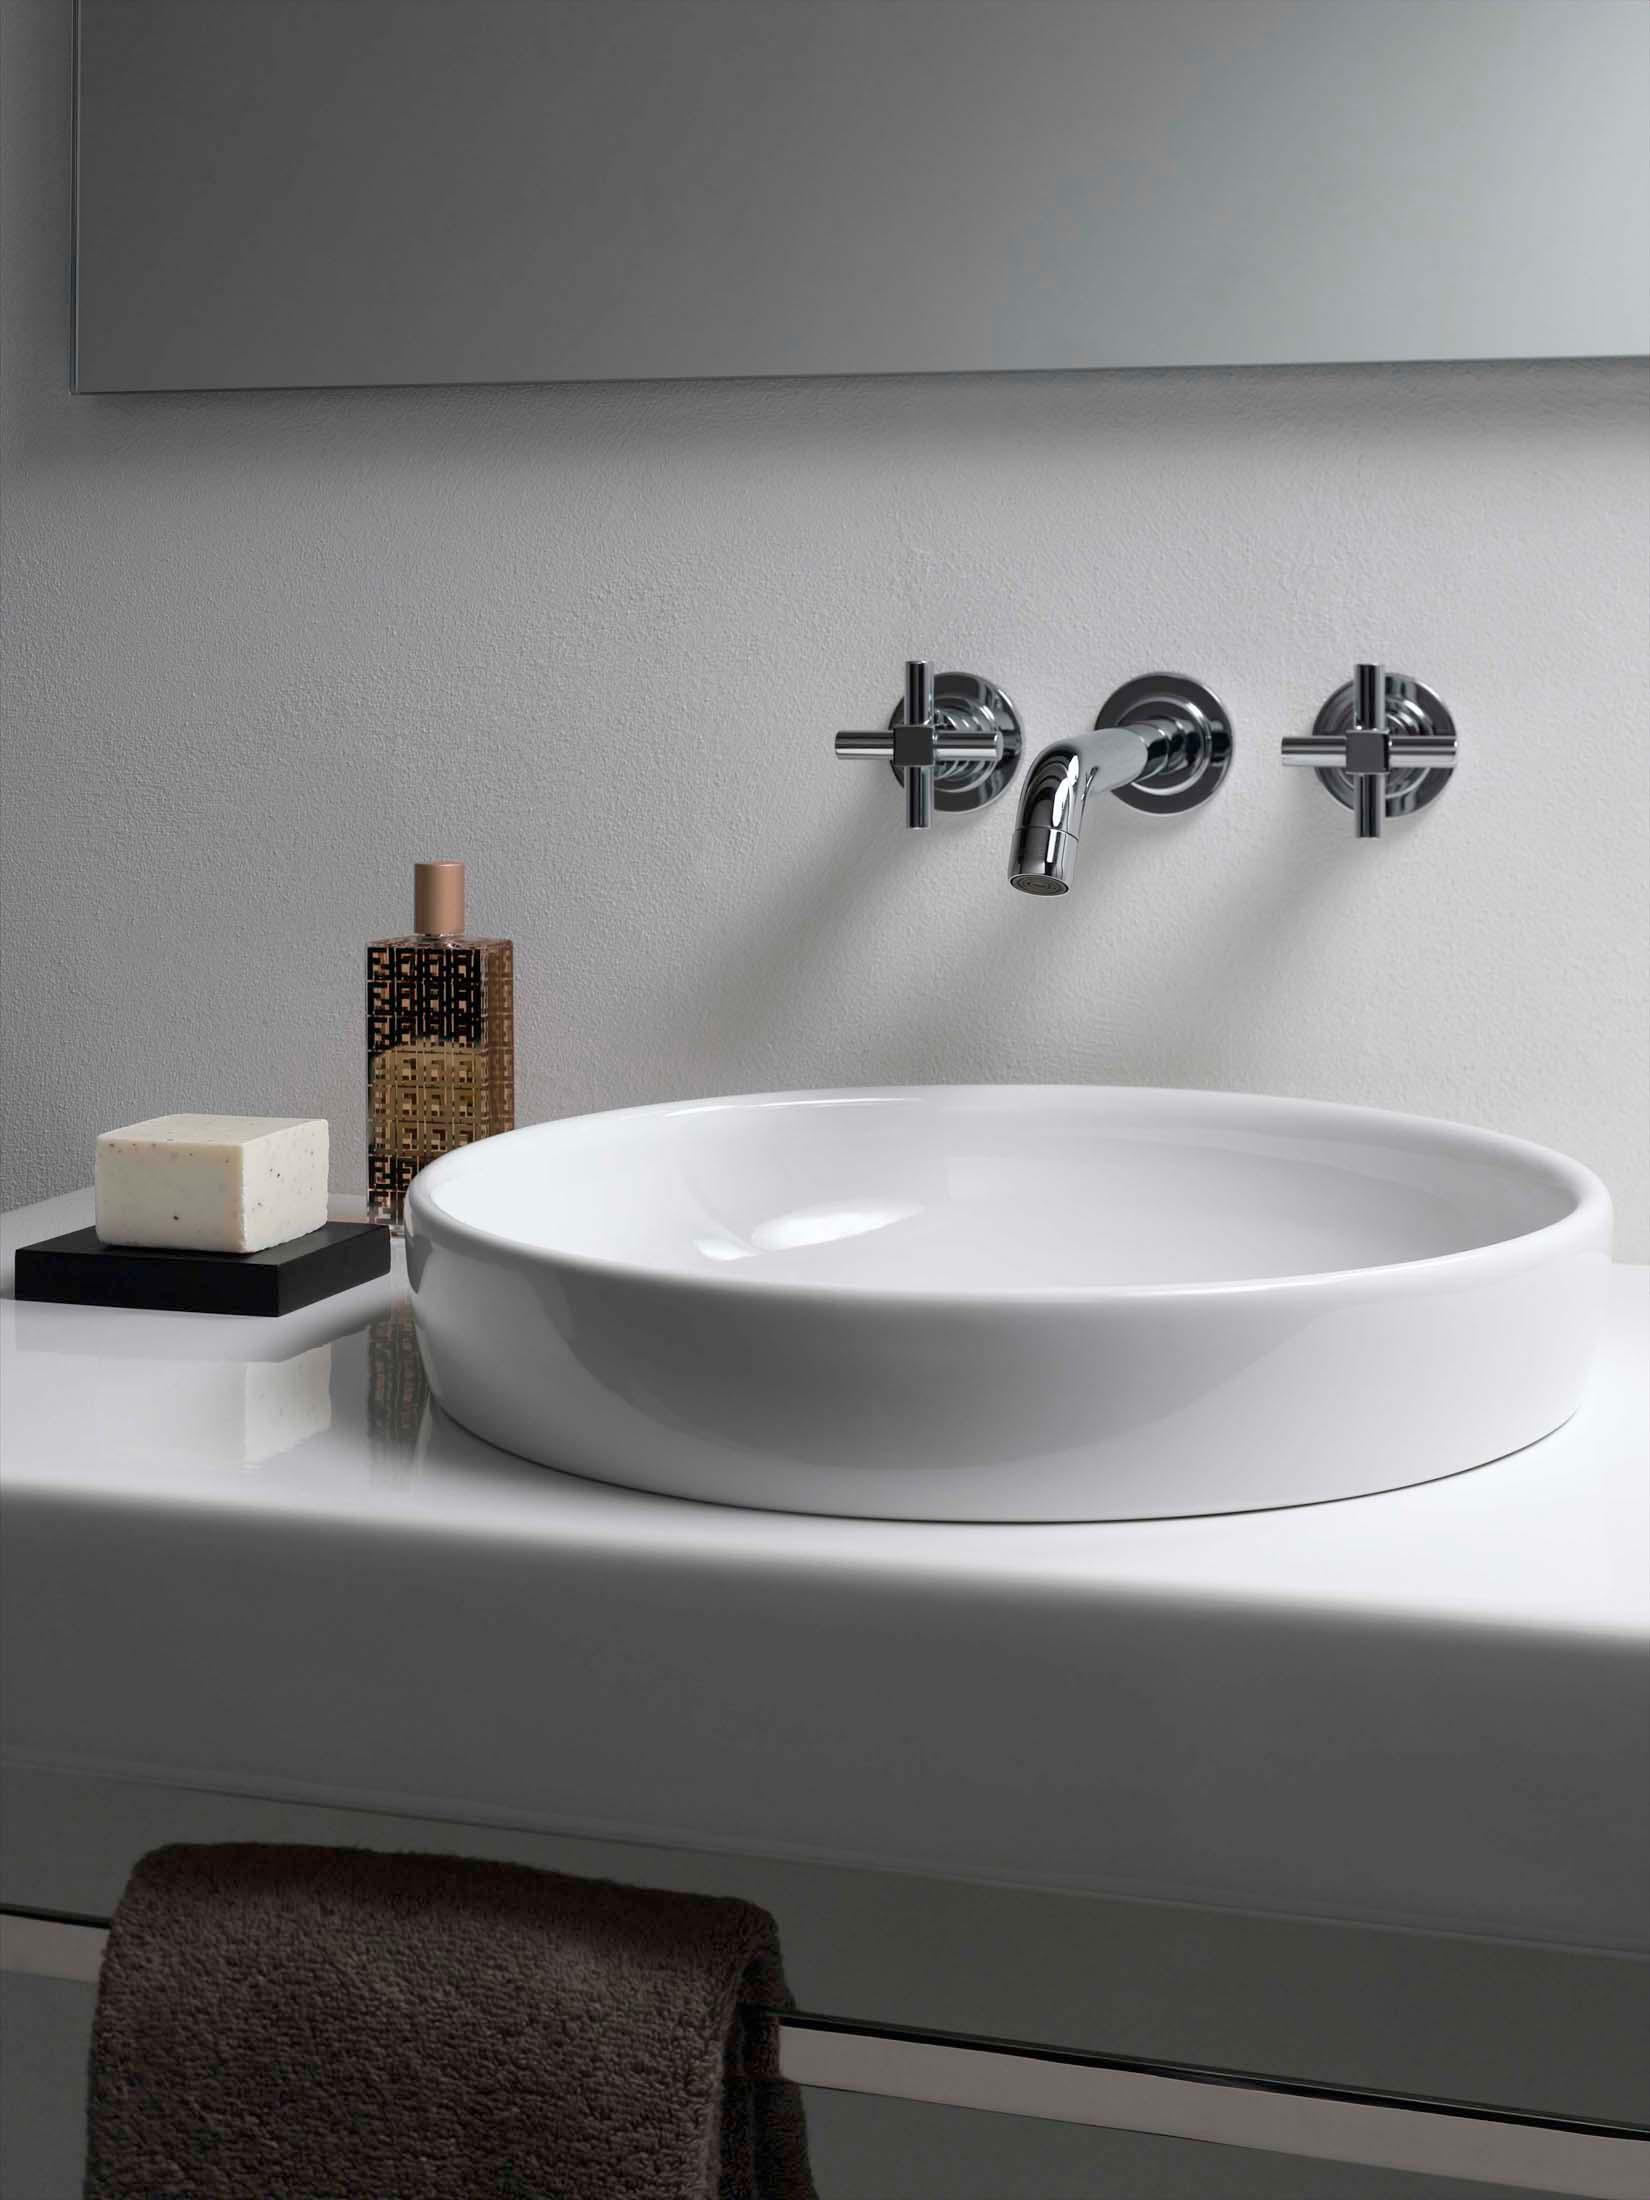 Water Jewels Counter Washbasin Undercounter Basin Wash Basins From Vitra Bad Architonic